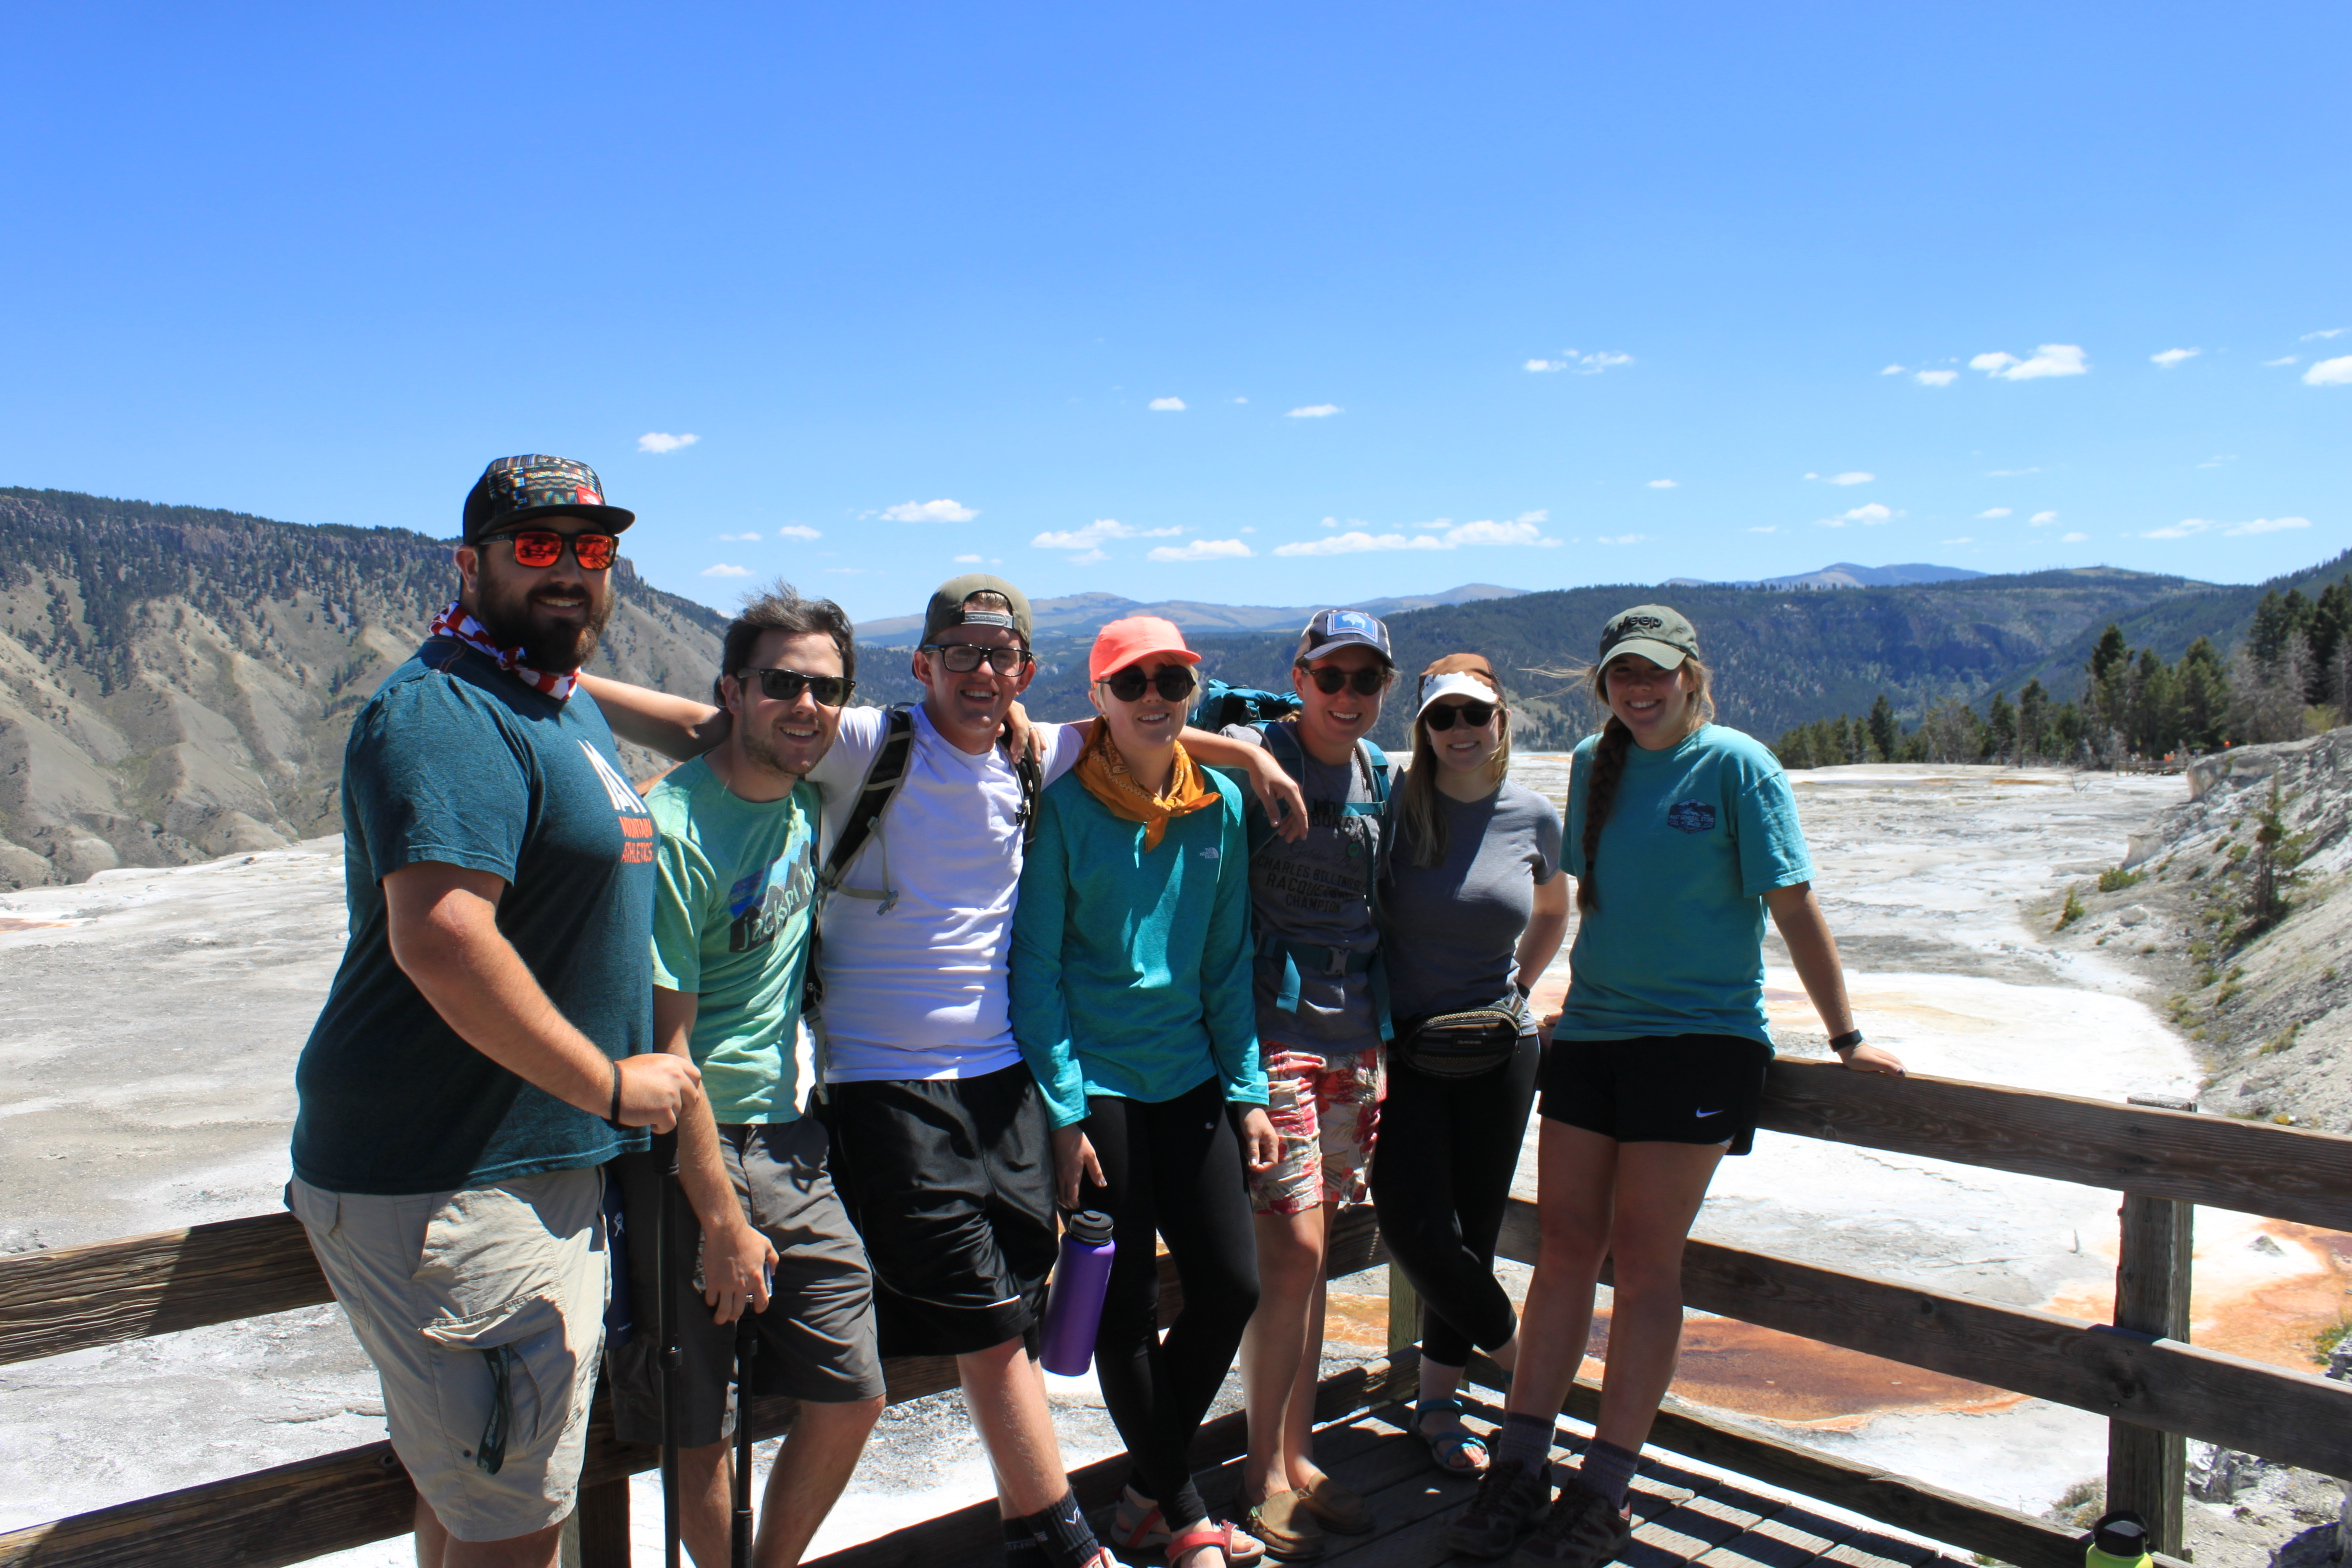 Mammoth Springs, Yellowstone National Park  Right to left: Richie Smissen, Lucas Smissen, Nathan Bieri, MaryPat Smissen, Whitney Walker, Kelsey Smissen, Jaclyn Toews